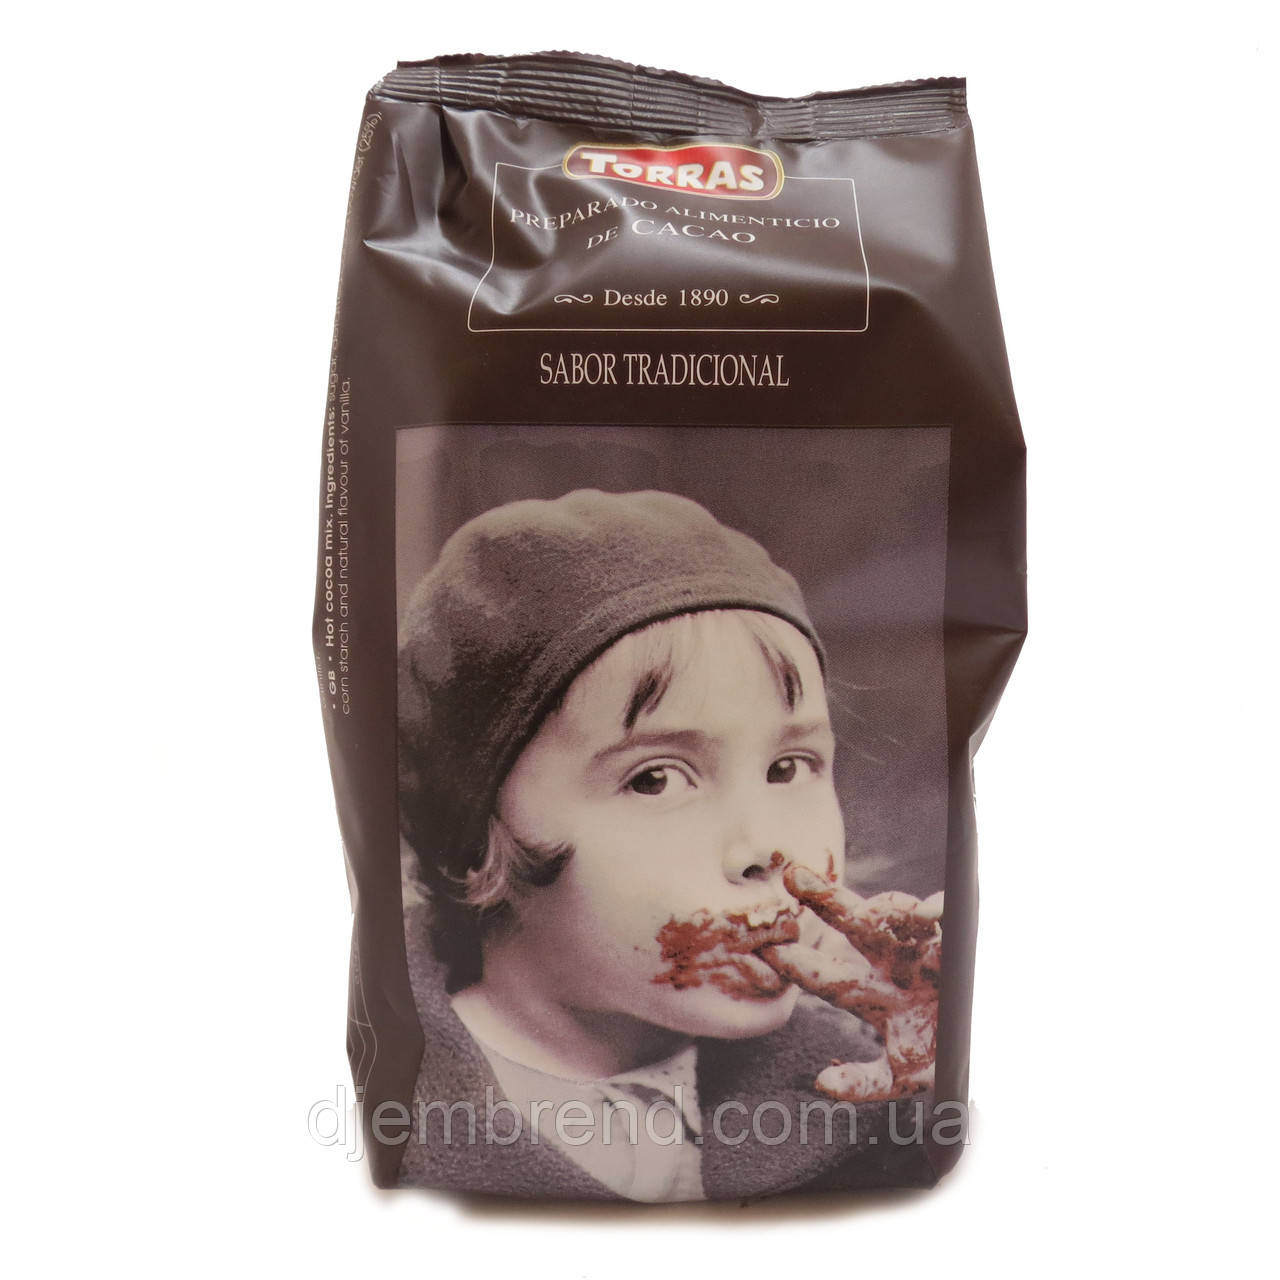 Горячий какао Torras Испания 360 г.